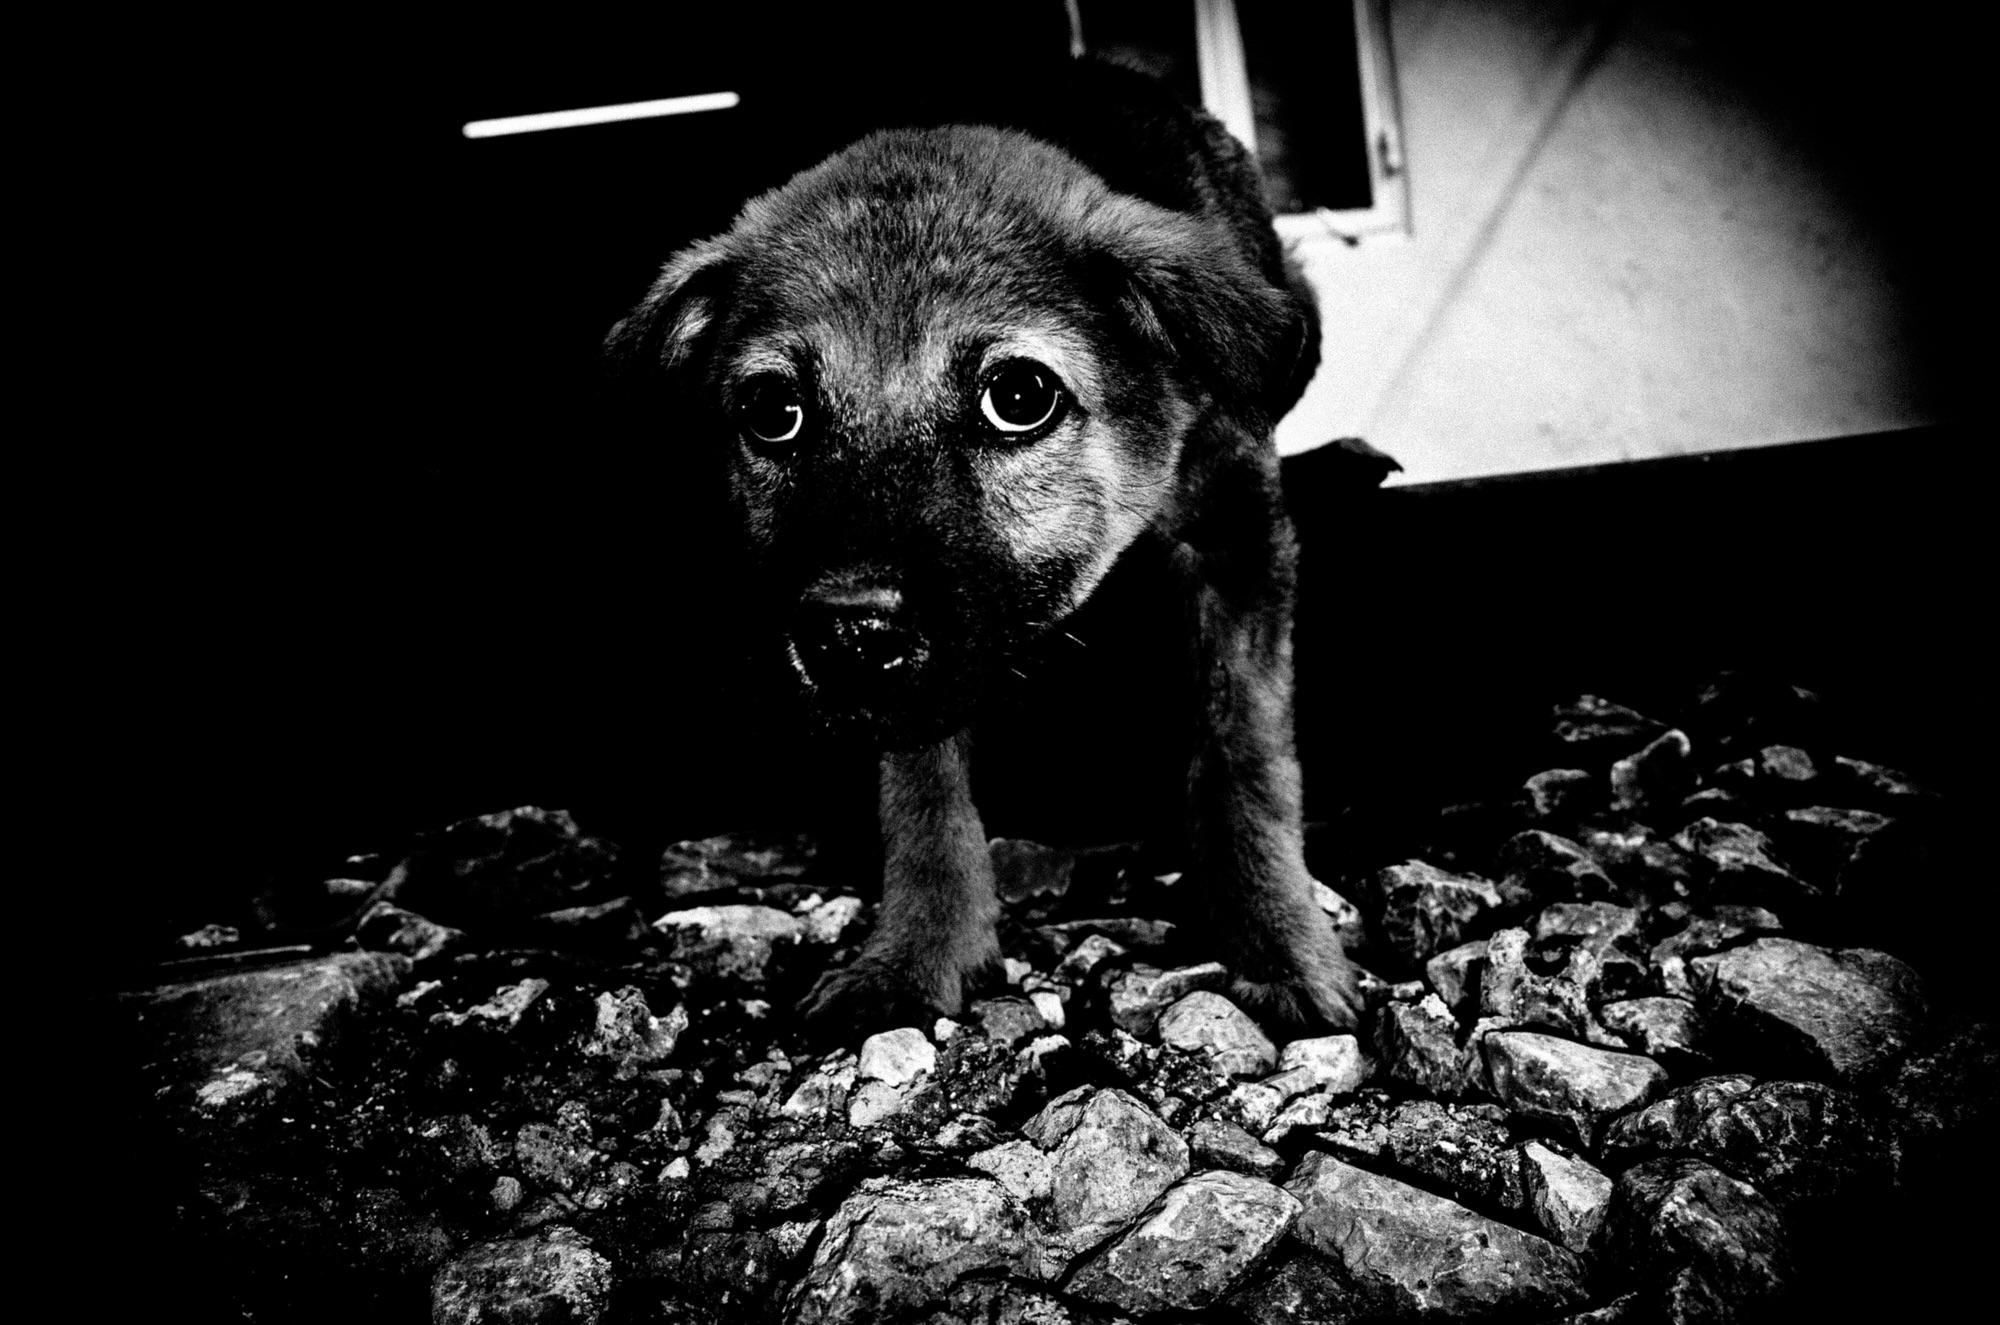 eric kim photography black and white dog puppy-0011682